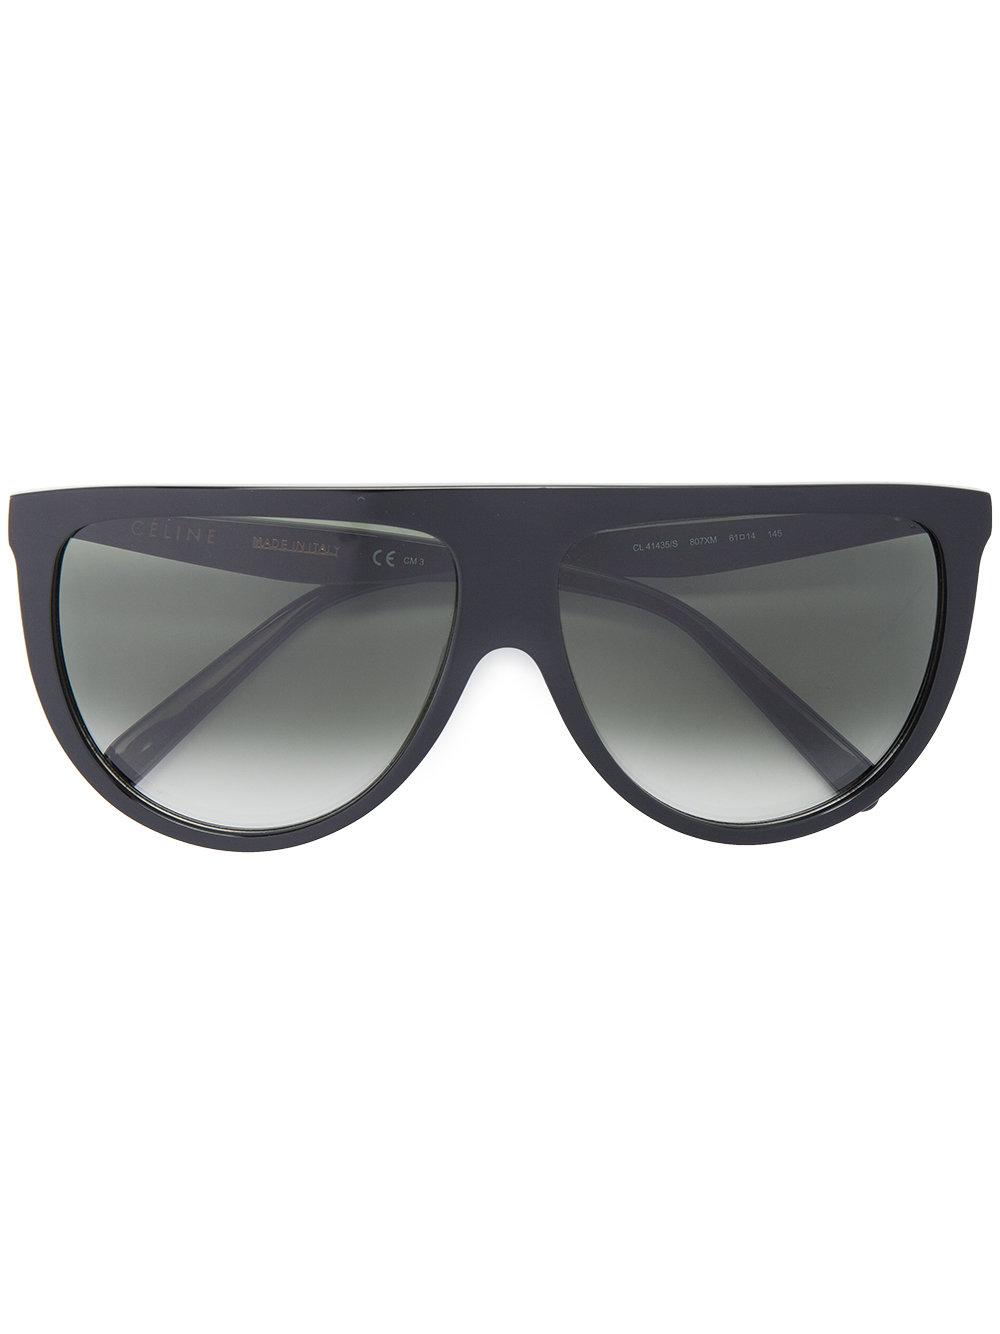 df7541bf4d48 Celine Thin Shadow Sunglasses Uk